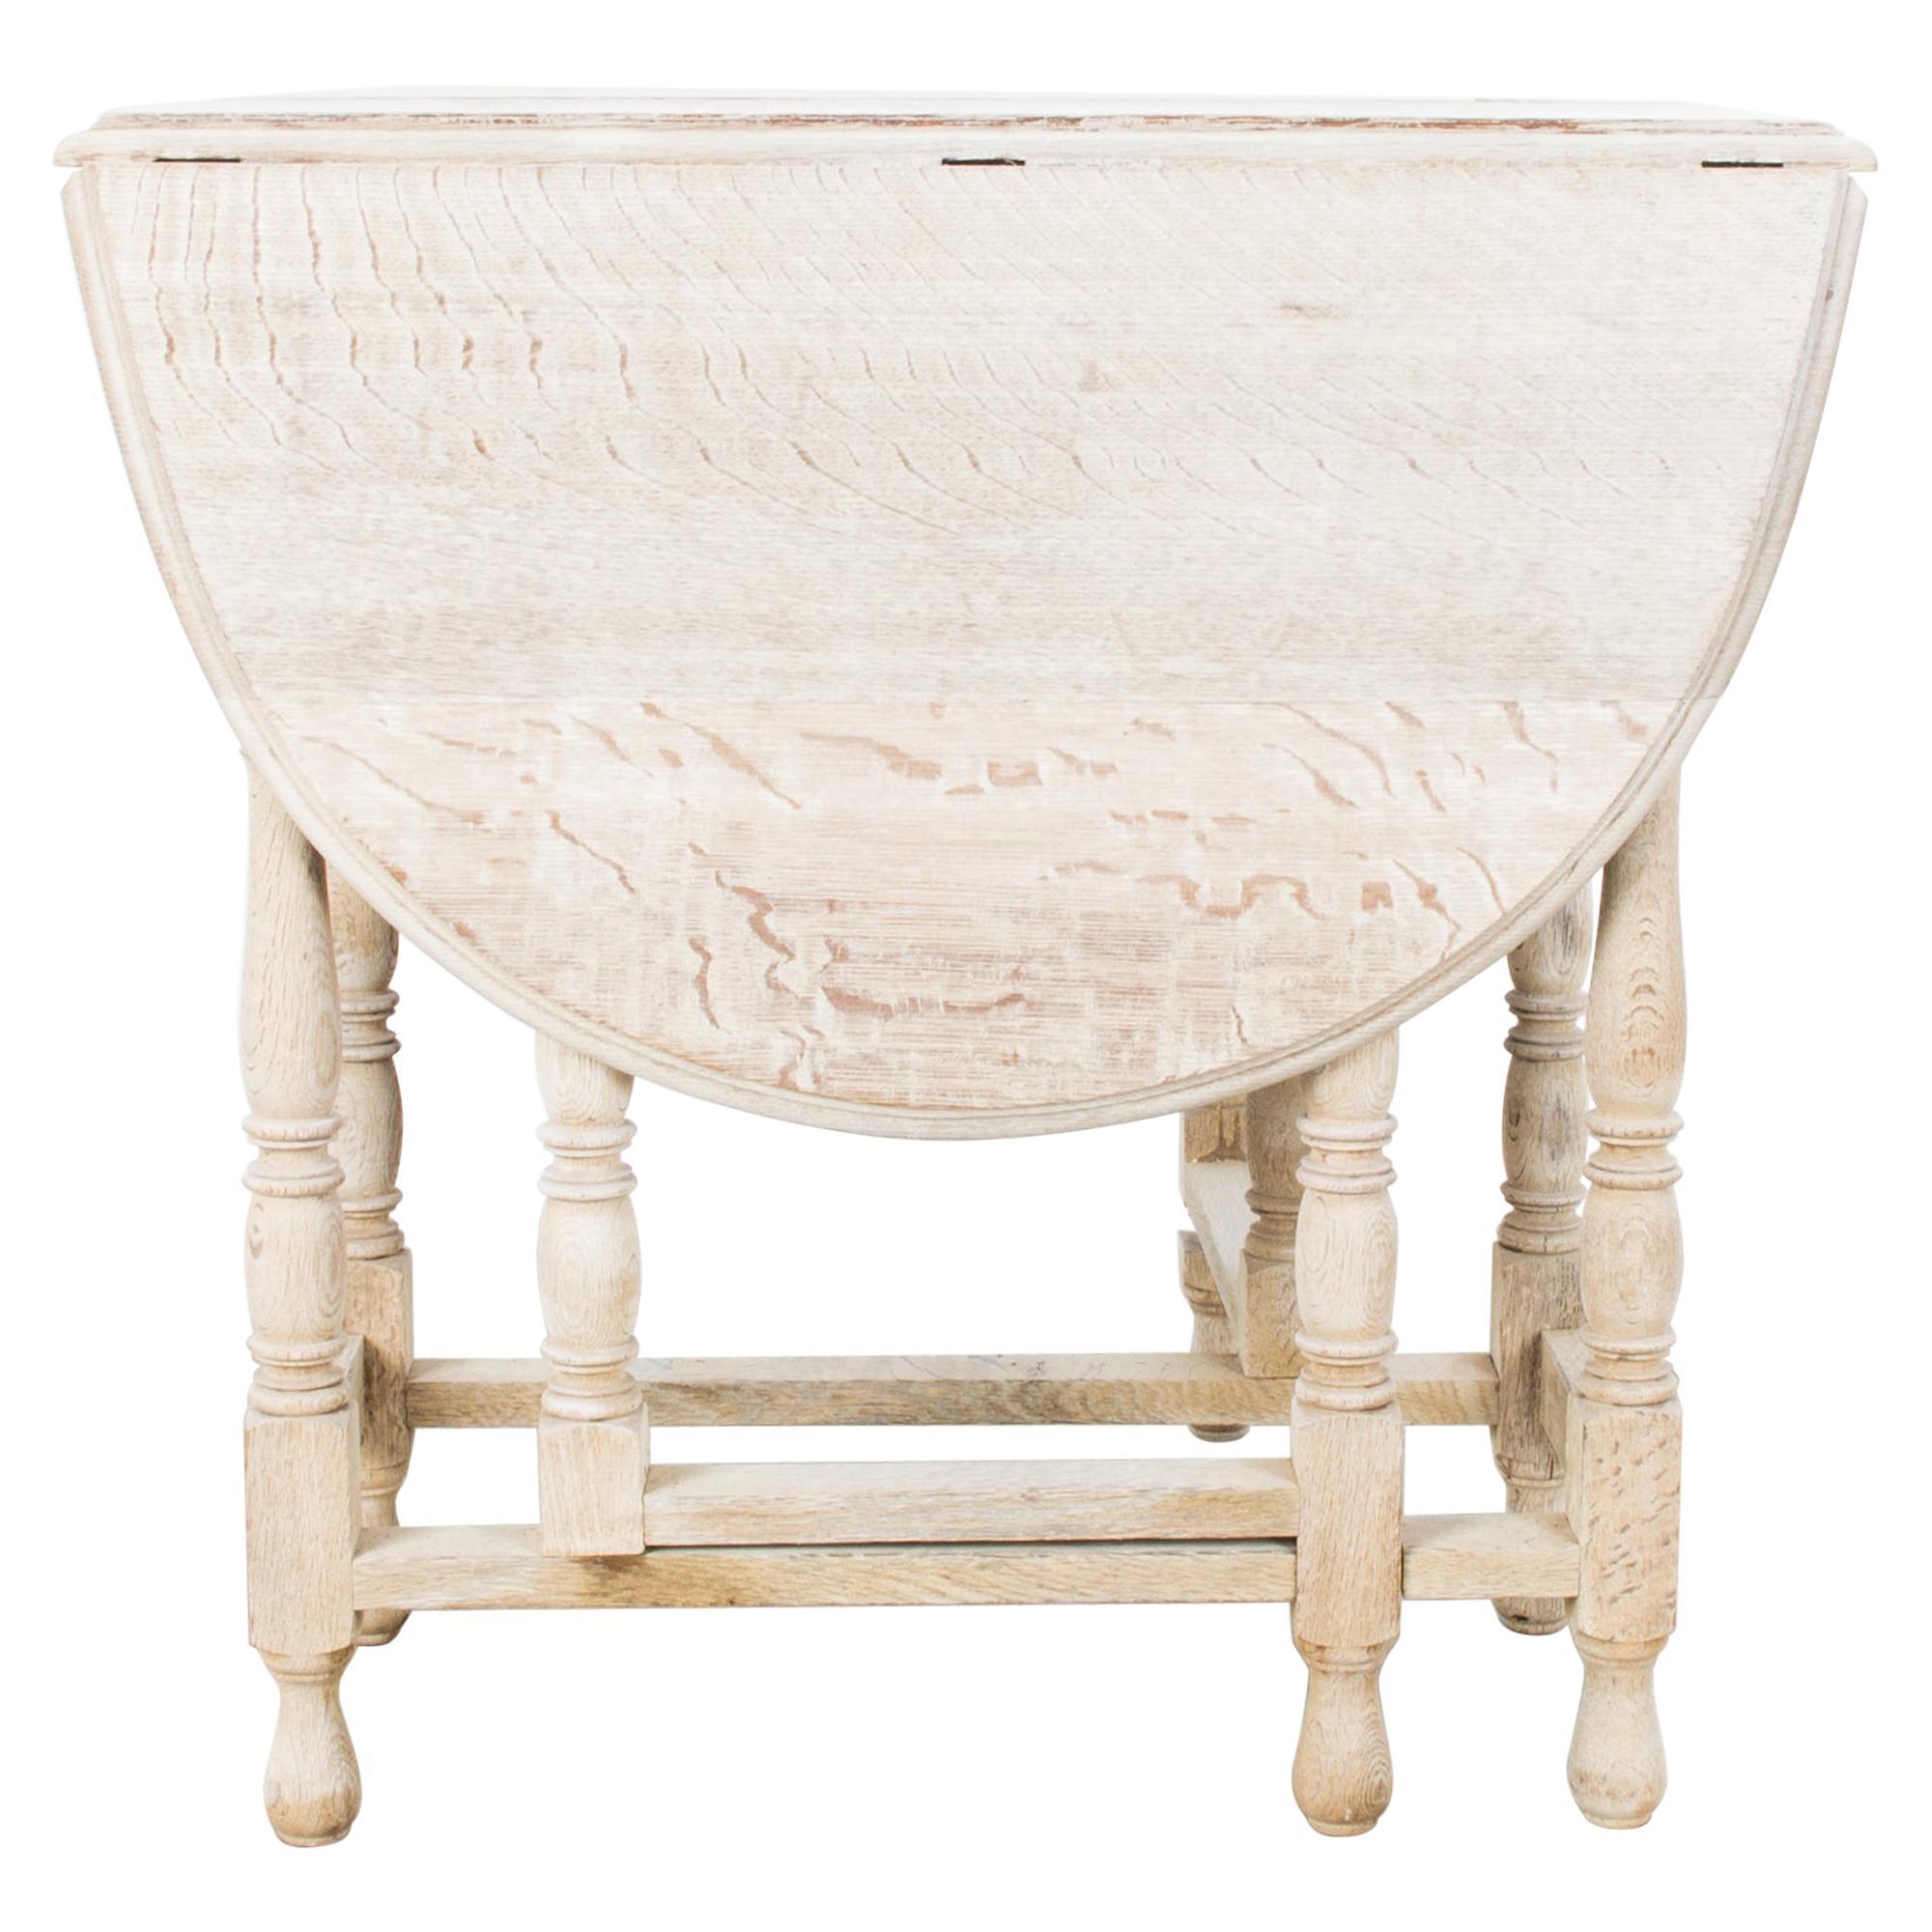 1900s British Oak Gate Leg Table